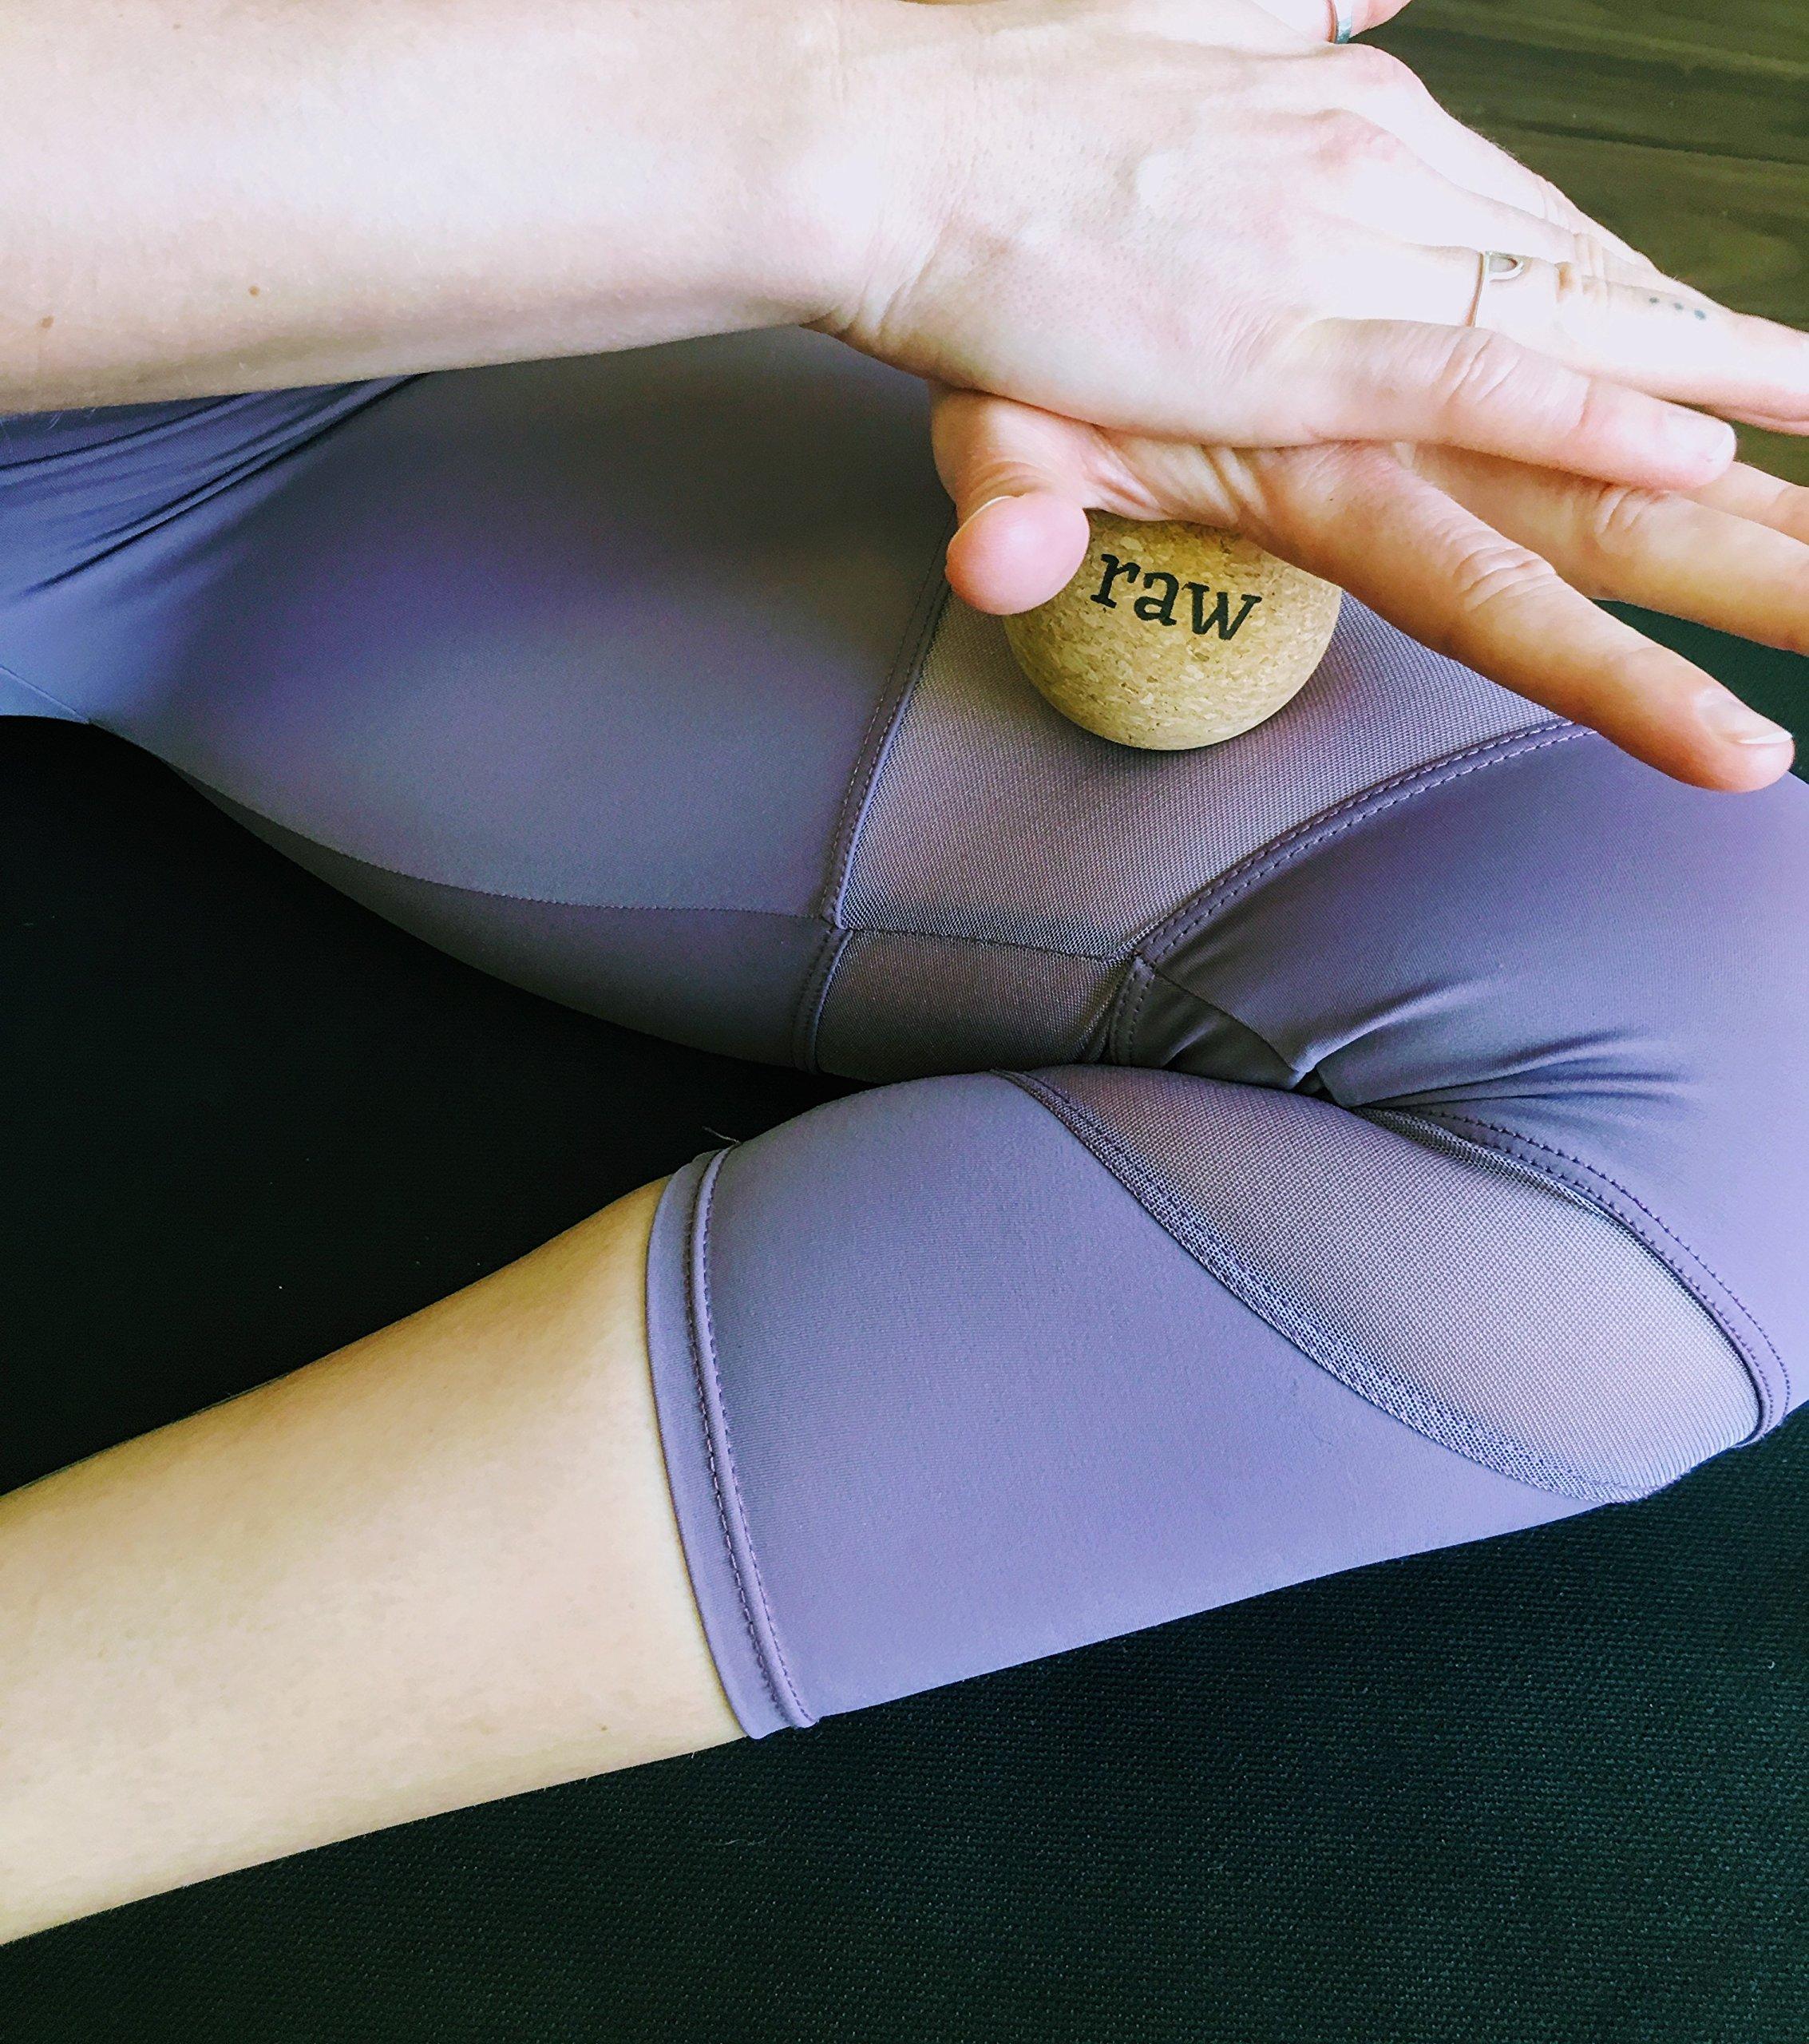 Rawlogy 100% Cork Massage Ball Set for Reflexology & Self-Massage (Firm) | Designed by Ultralight Hikers